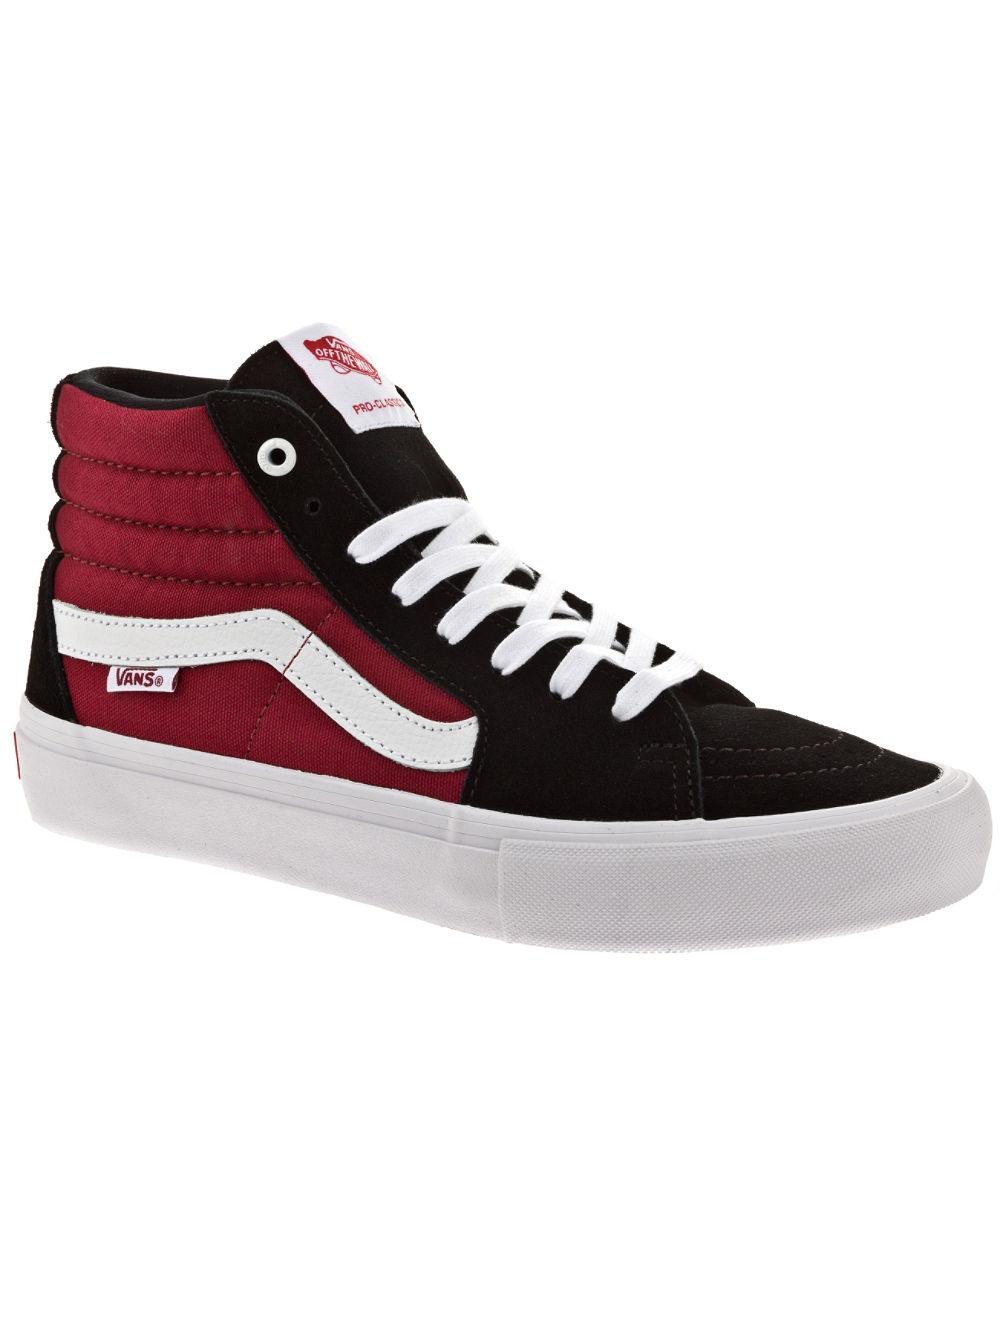 6184e2ca7bf1bd Buy Vans Vans x Real Sk8 Hi Pro Sneakers online at Blue Tomato